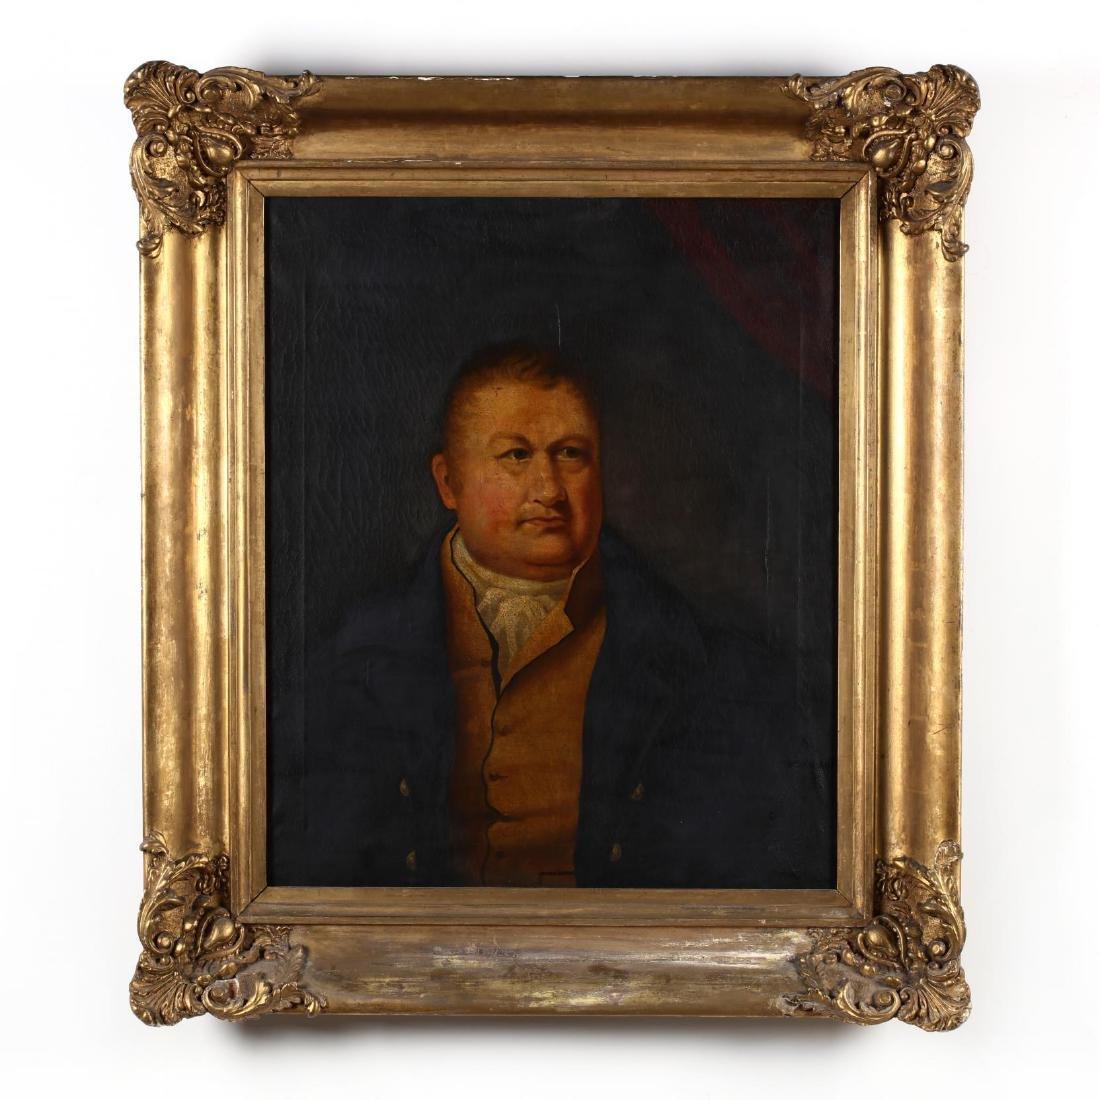 An Antique English School Portrait of a Man